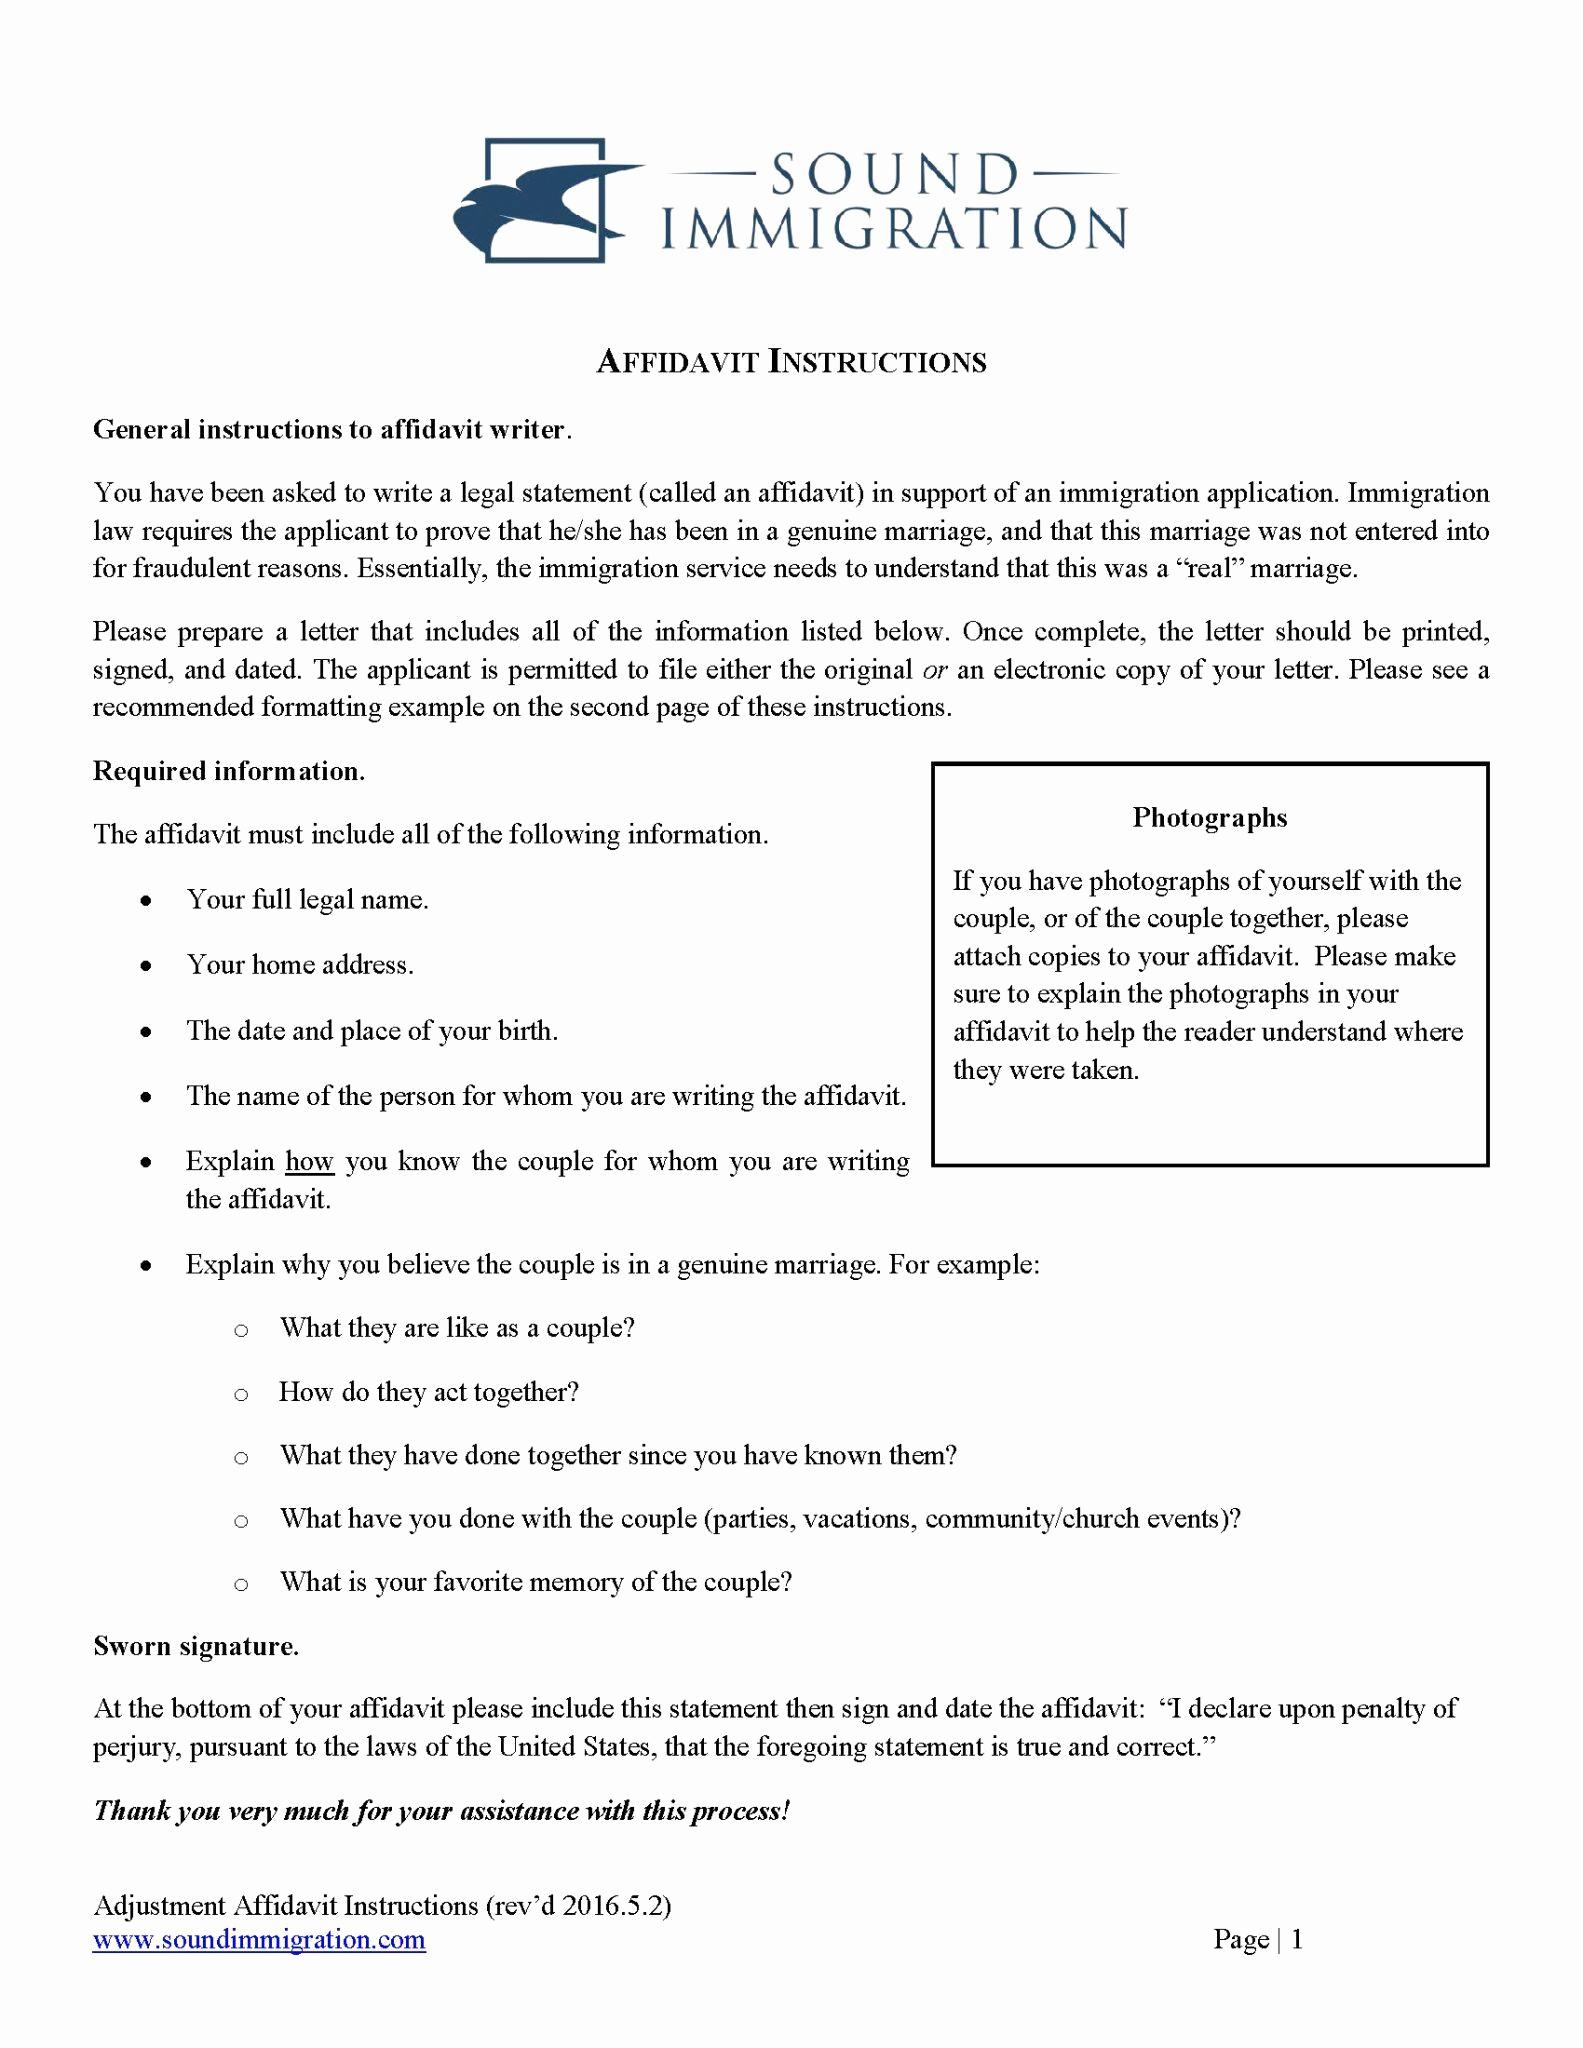 Affidavit Of Support Letter Best Of Affidavit Instructions for Marriage Based Applications